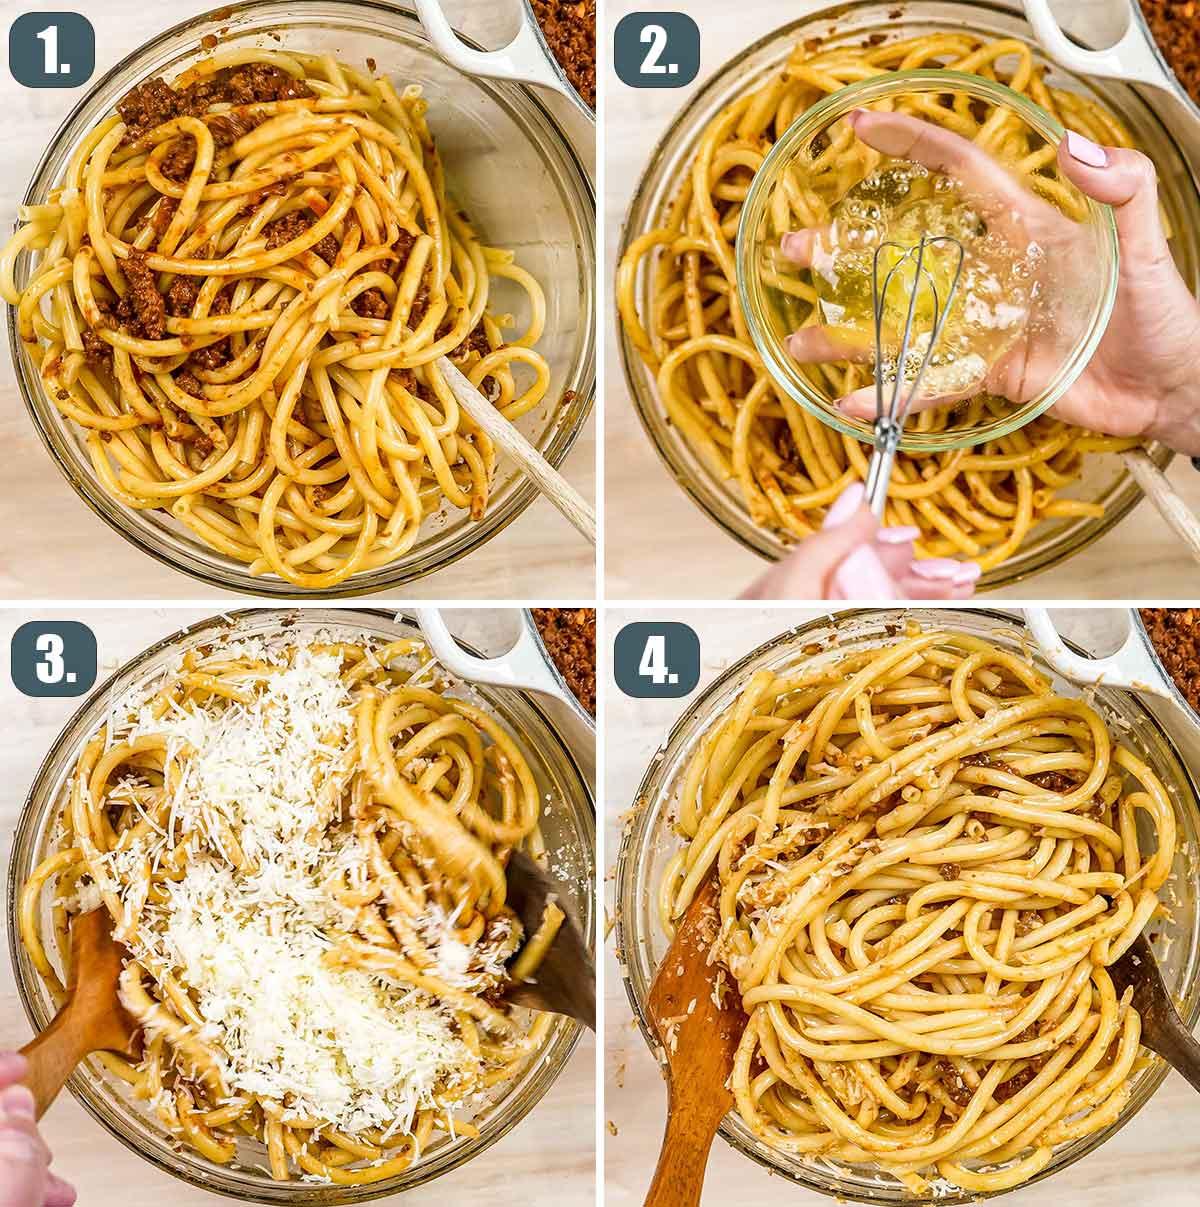 process shots showing how to prepare pastitsio pasta.